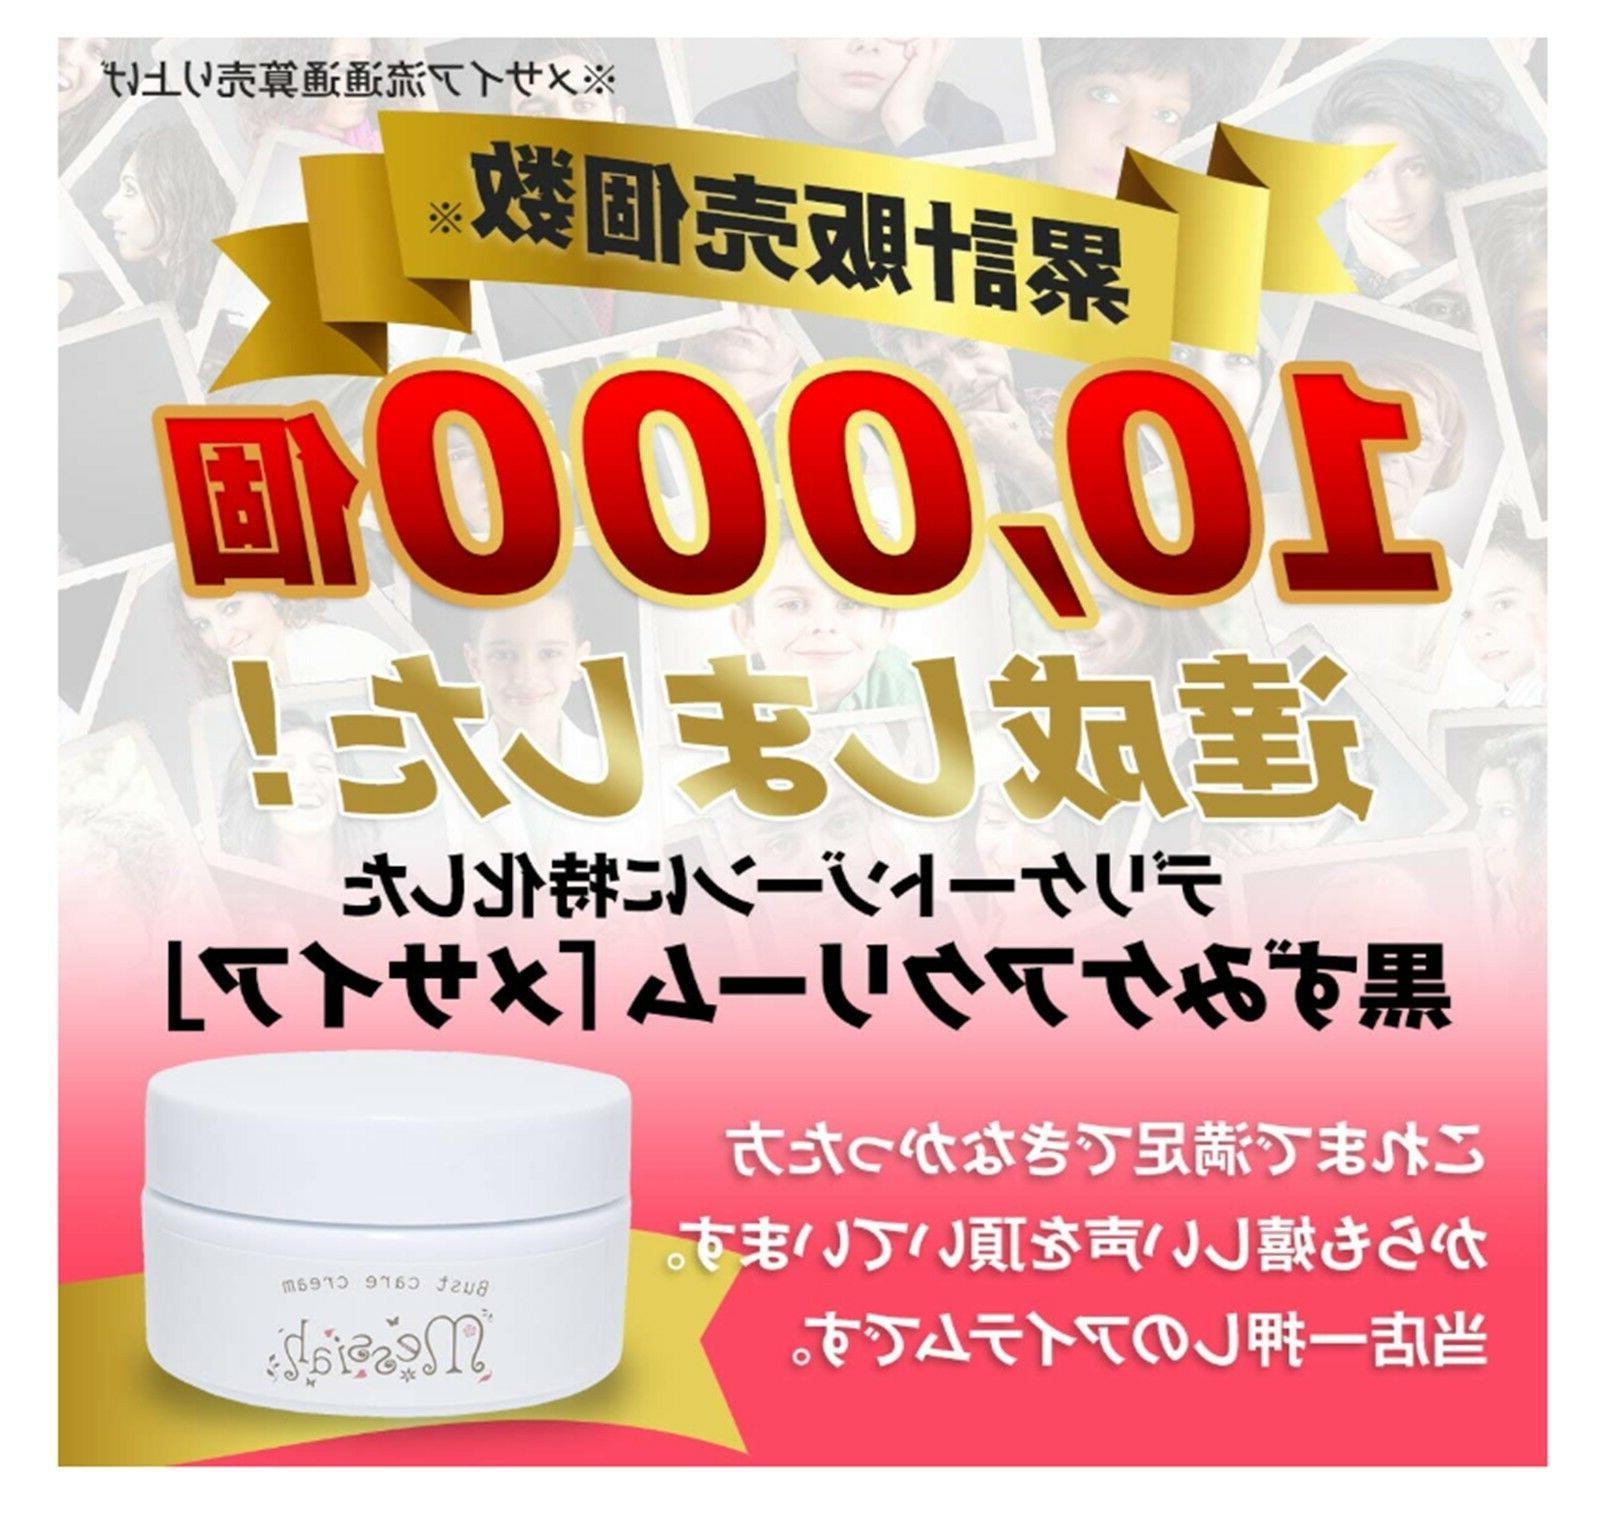 Messiah maternity body cream 30g X nipple & delicate skin cream